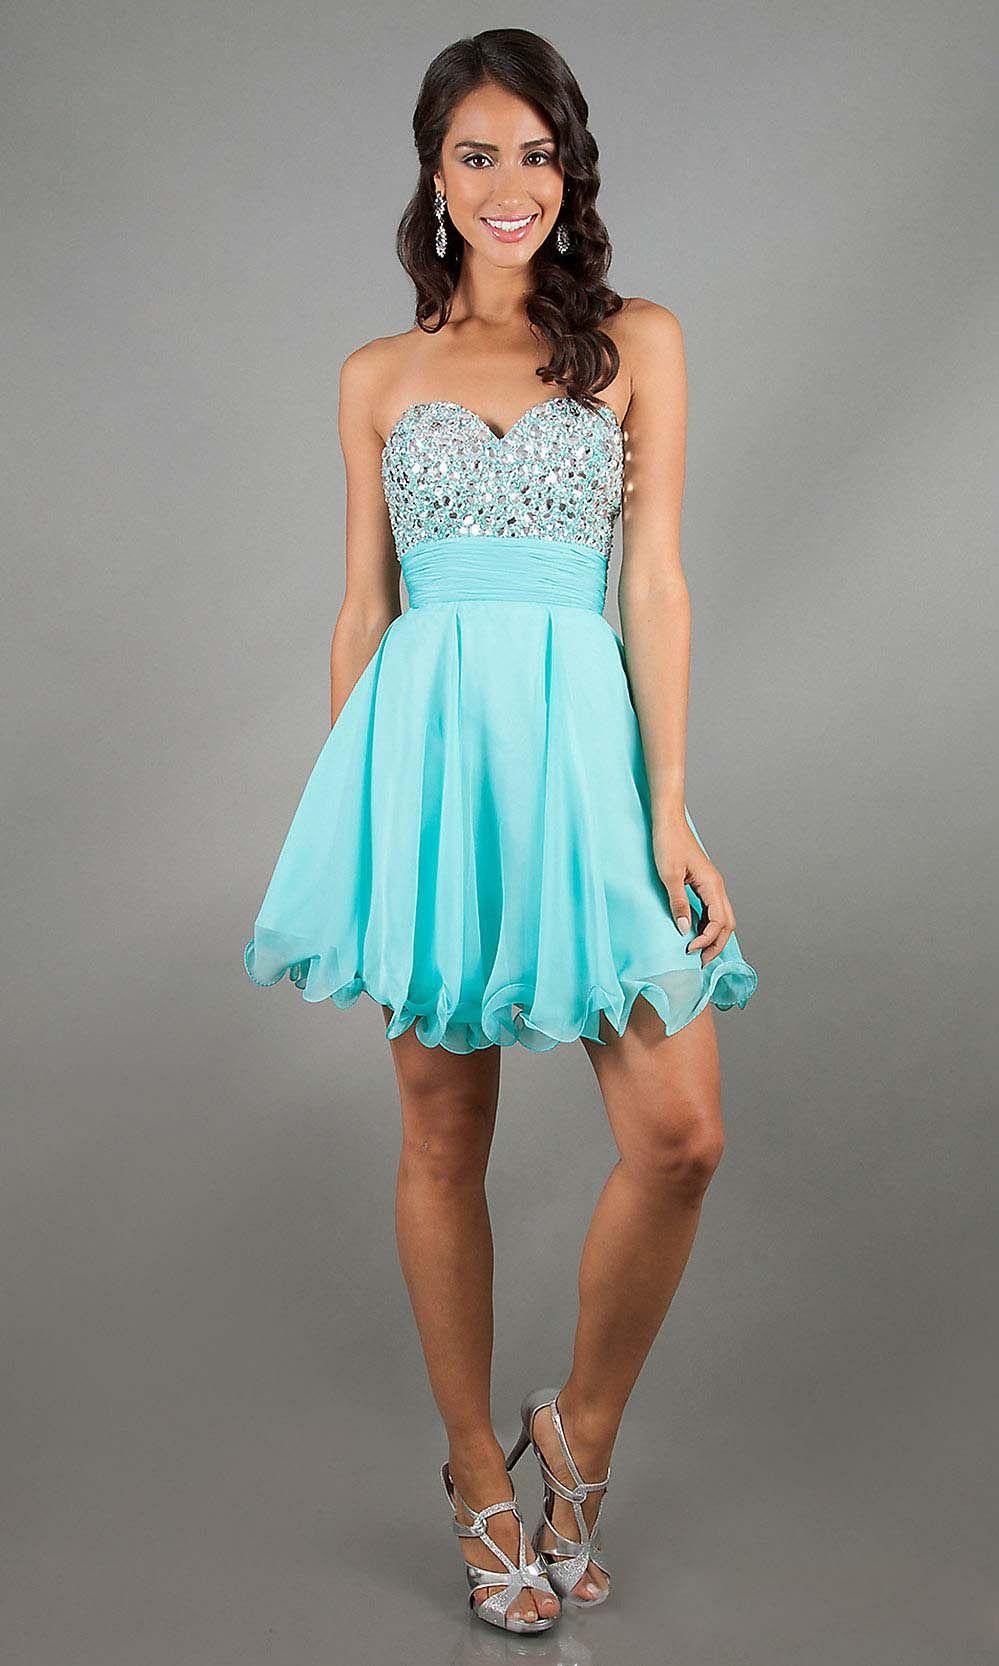 Okbridaldress tiffany blue prom dress affordable prom dresses